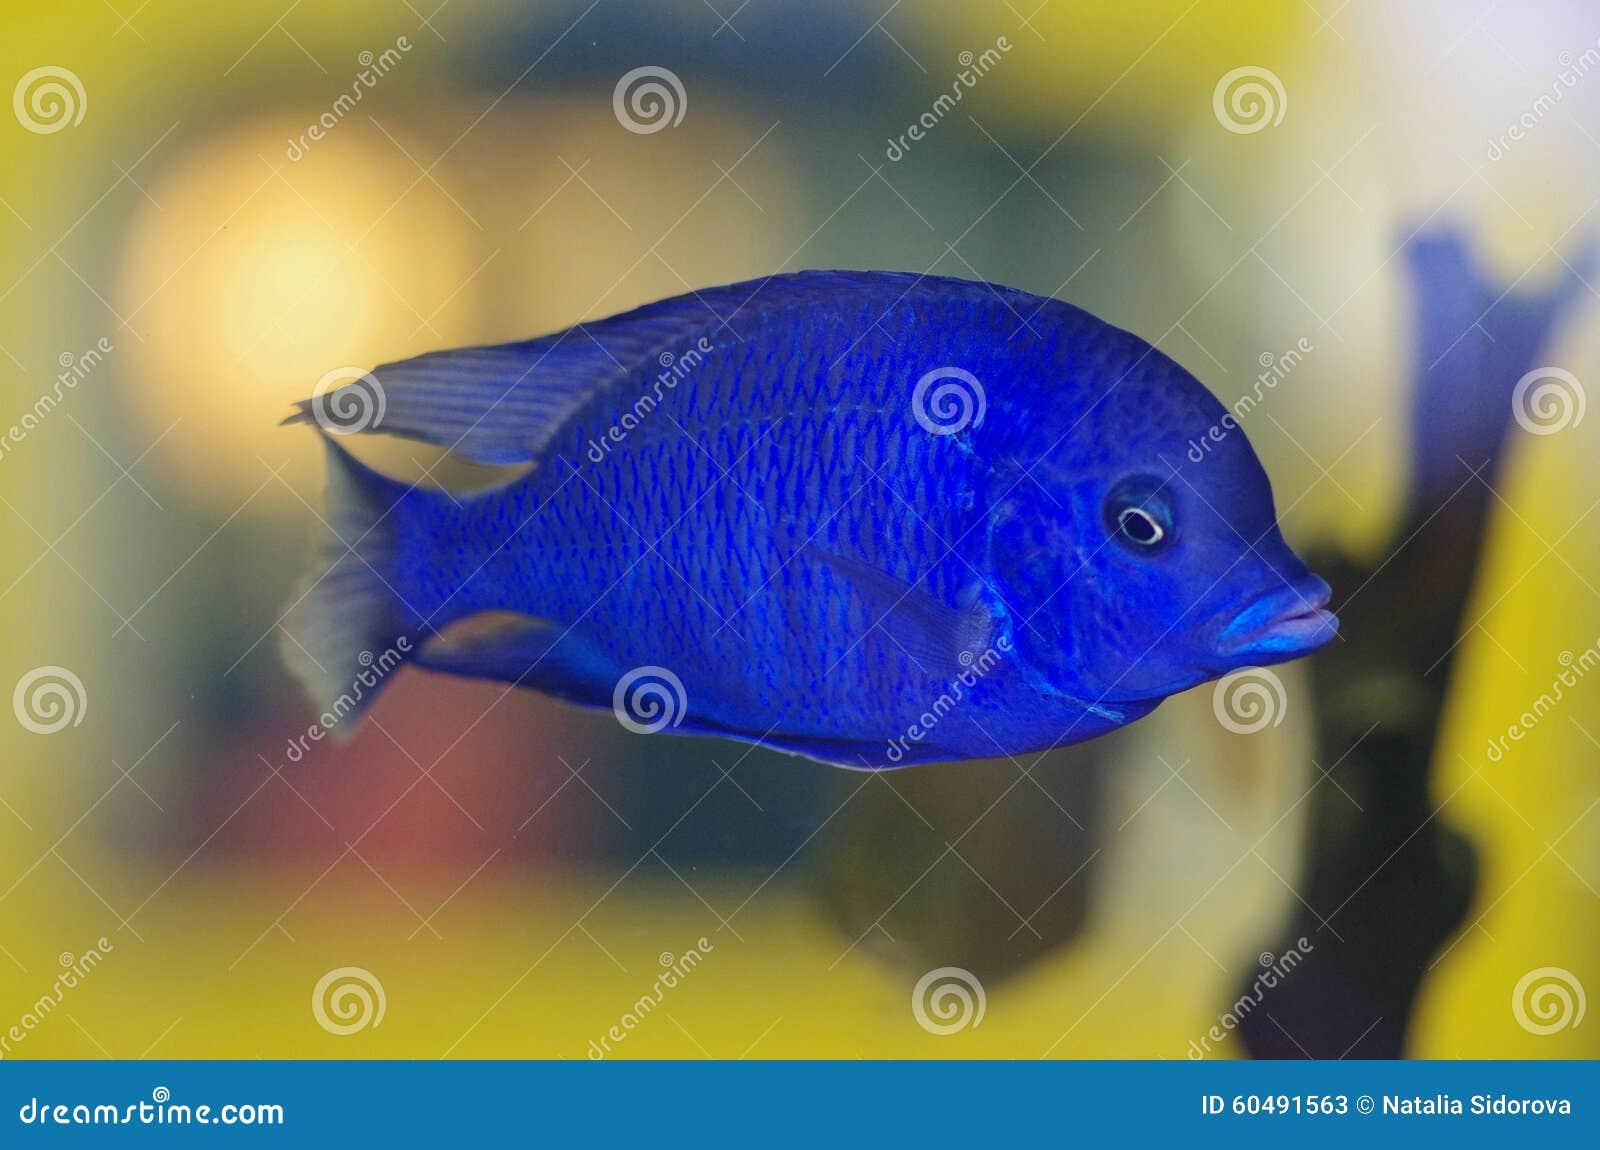 Malawi blue dolphin stock photo image 60491563 for Blue fish aquarium